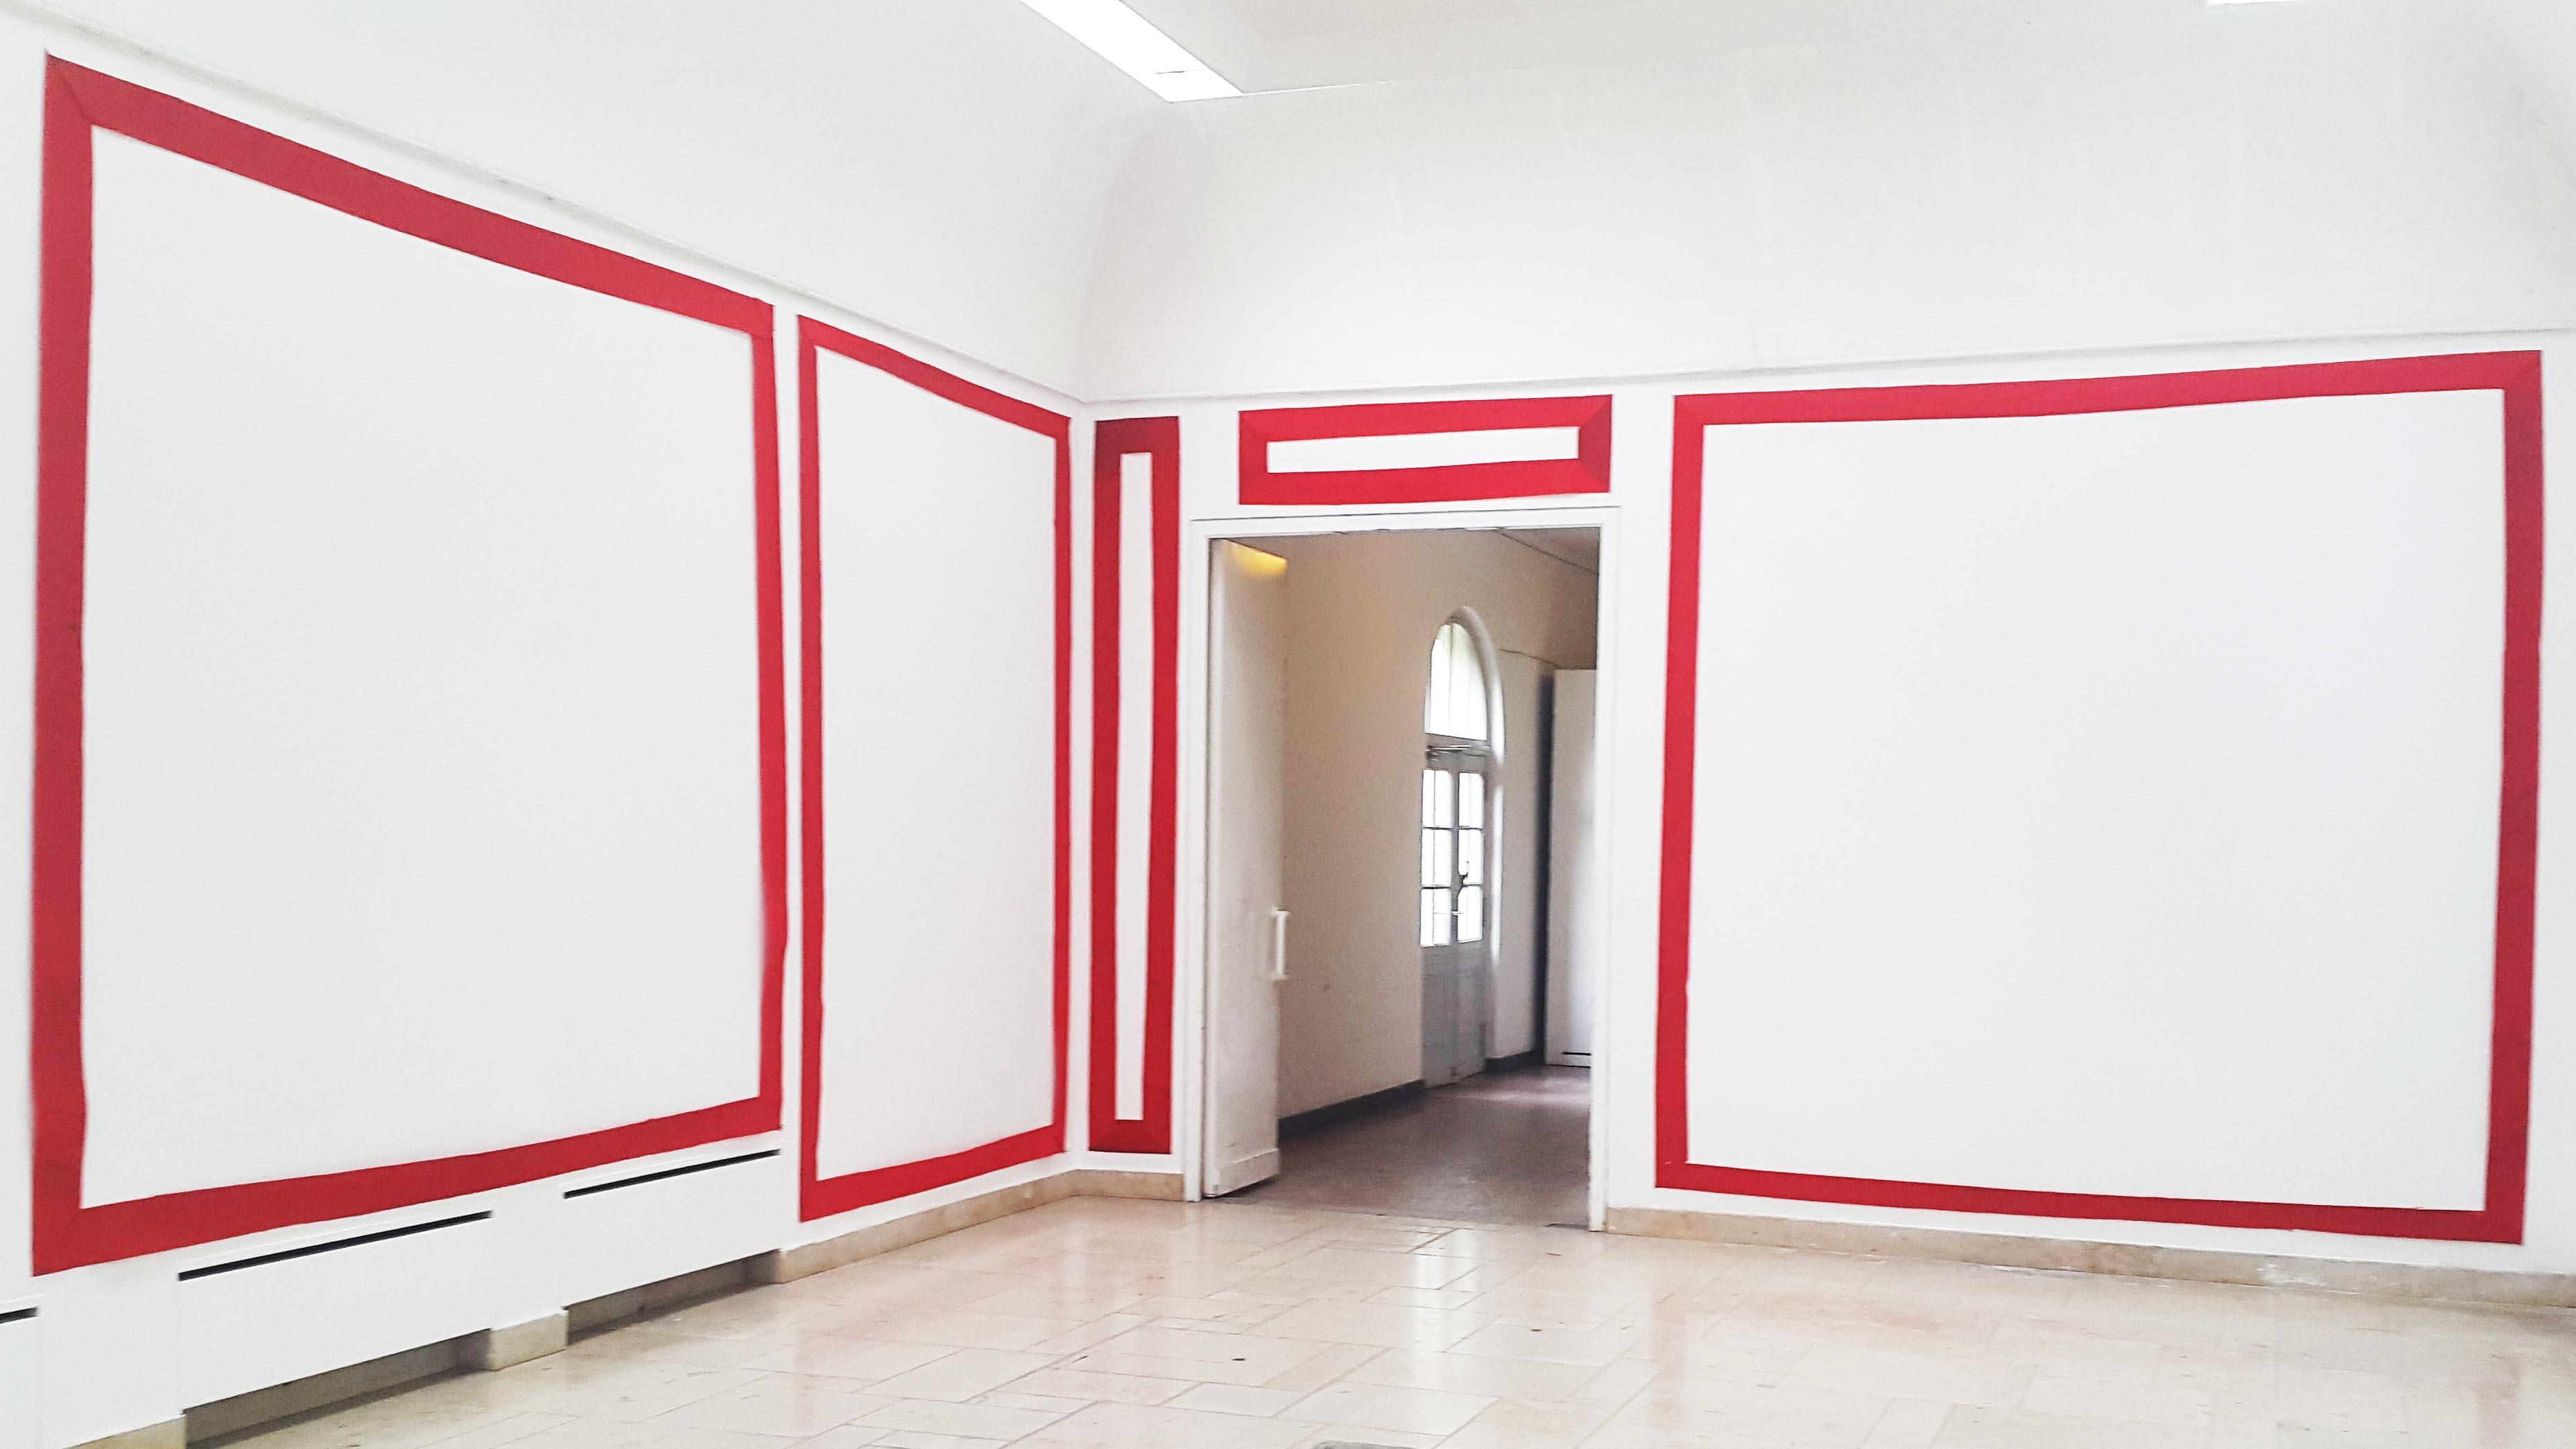 wall_installation_quergalerie1_web